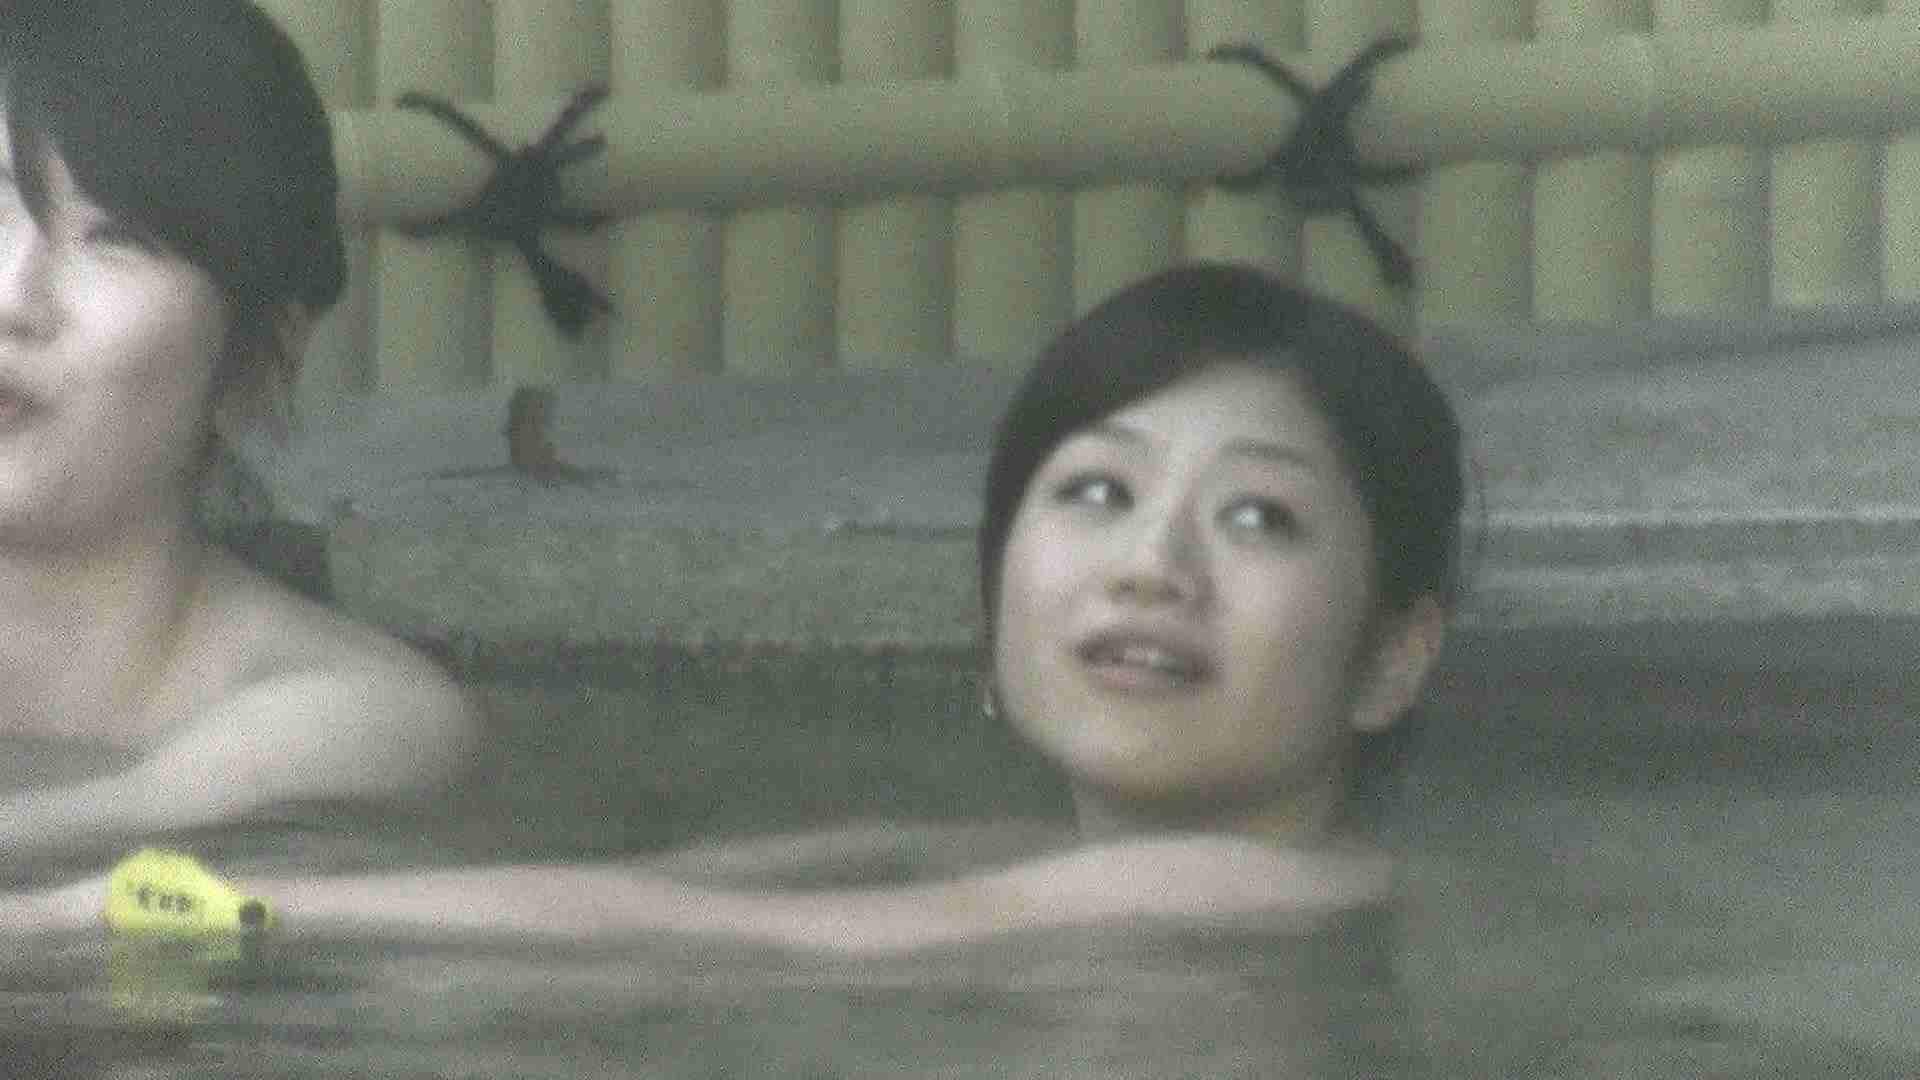 Aquaな露天風呂Vol.206 露天 エロ画像 59連発 19